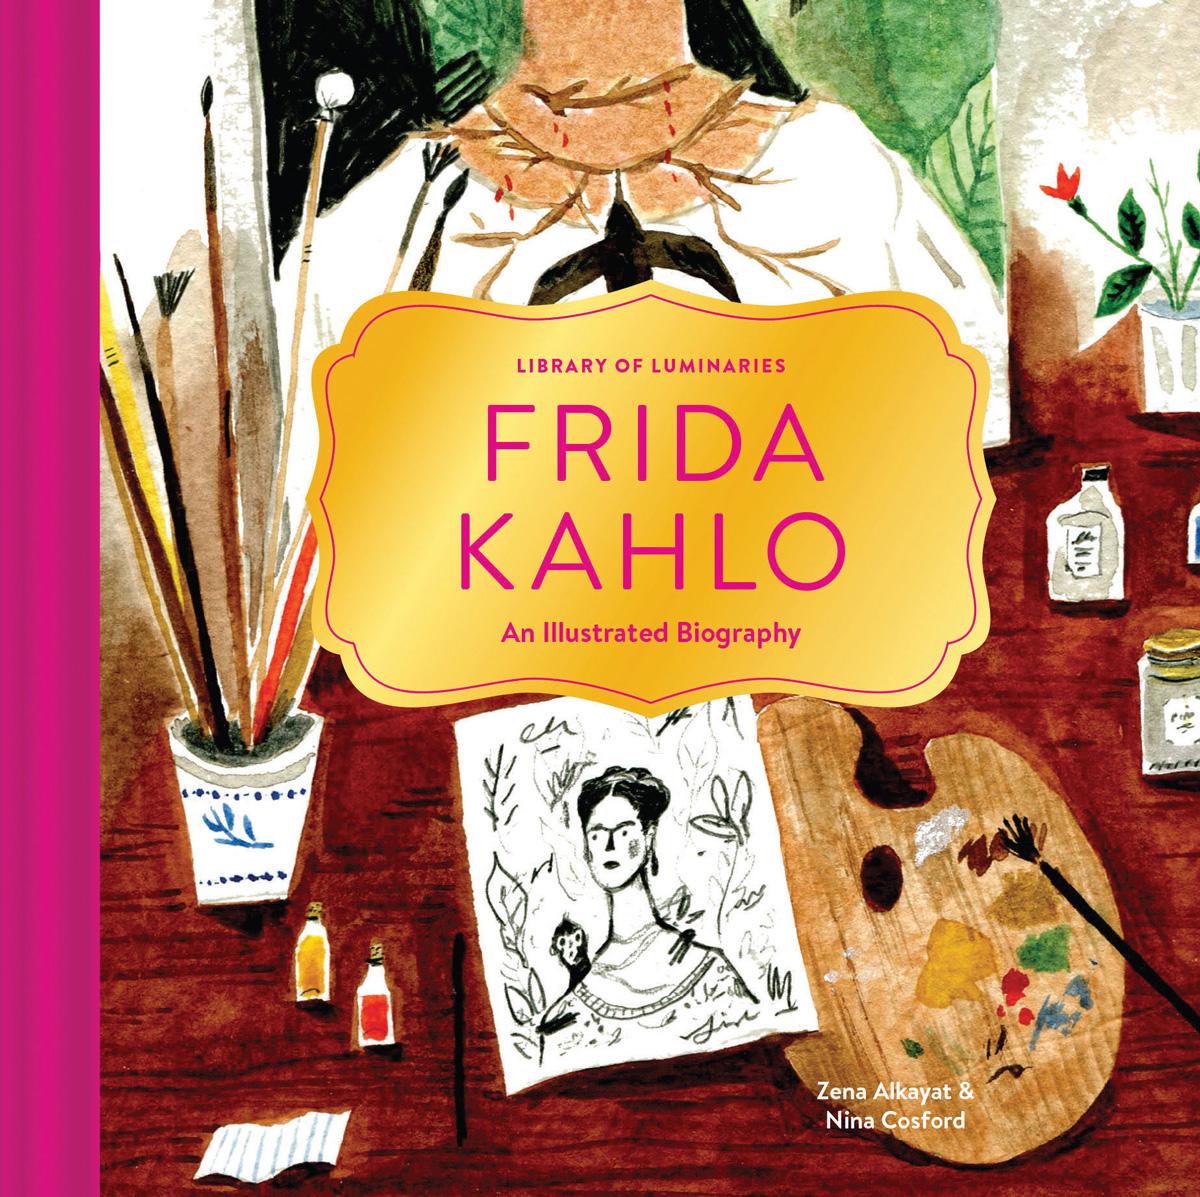 Frida Kahlo's Illustrious Life, Illustrated